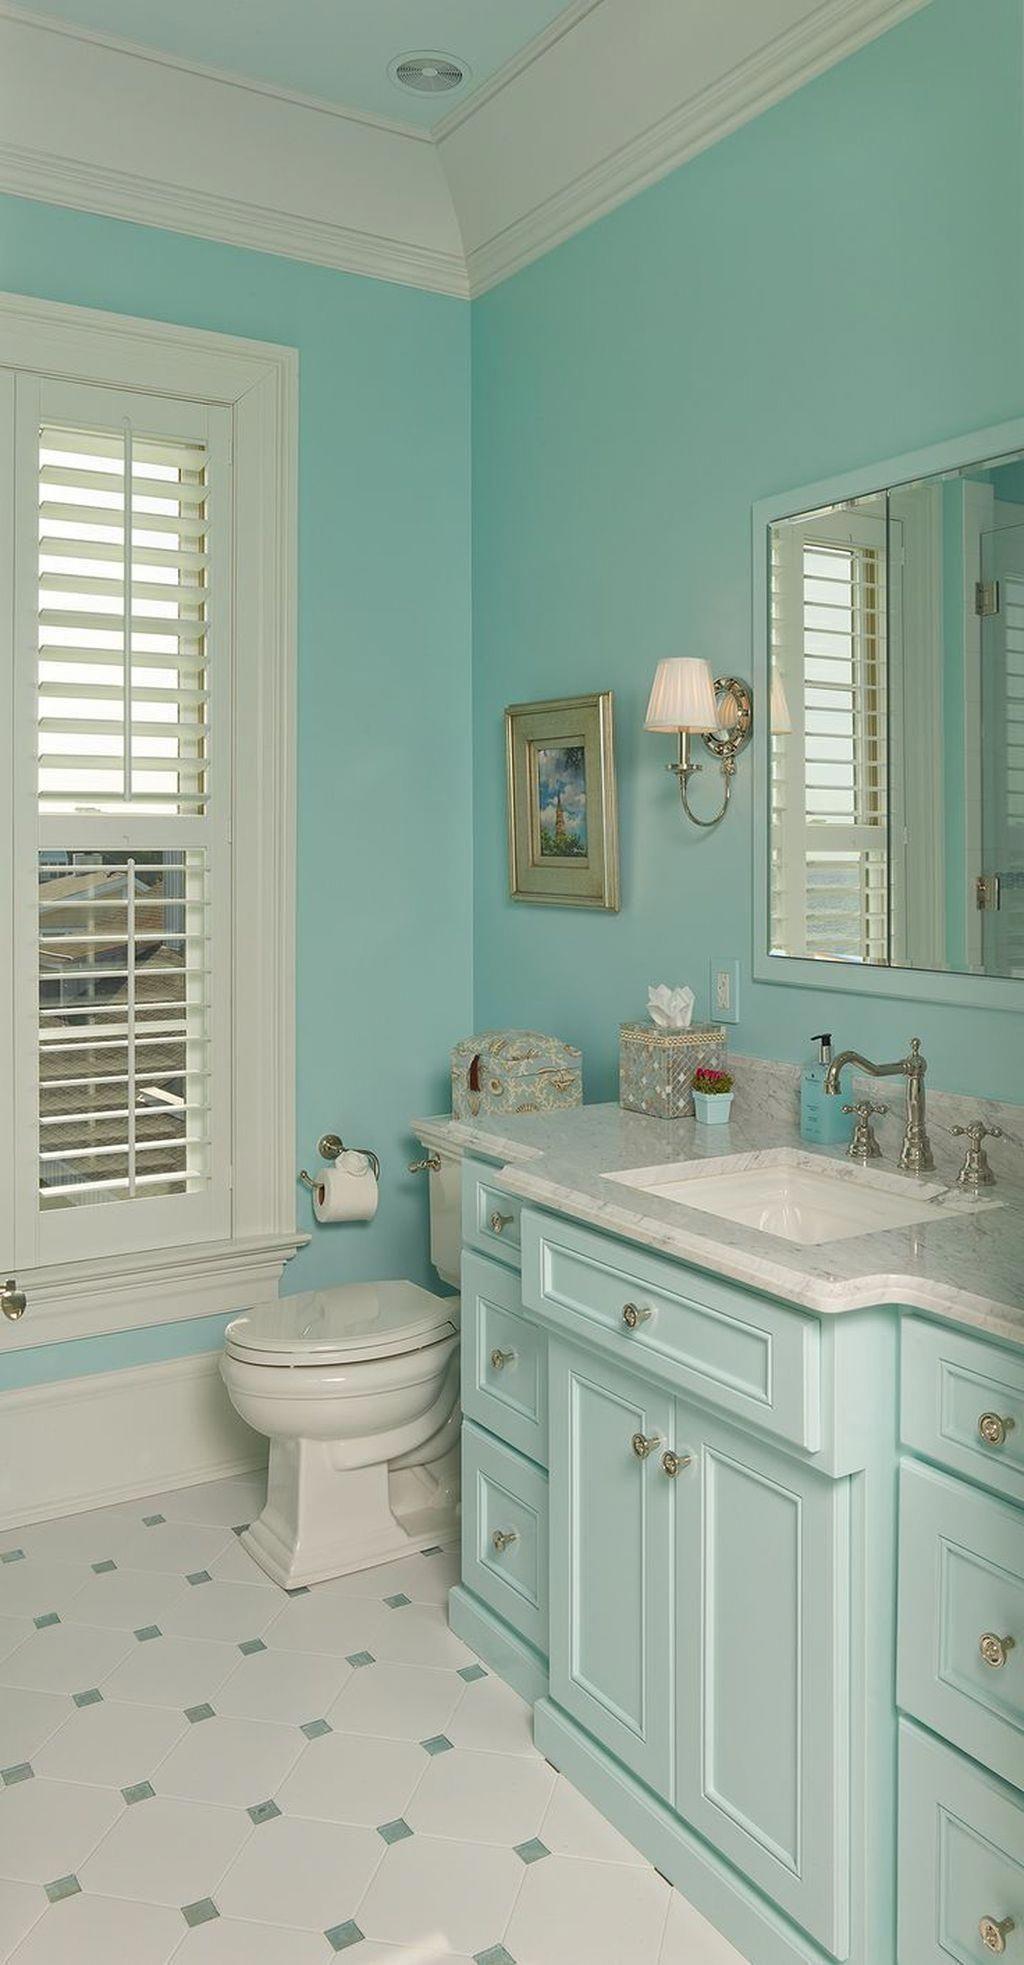 What Color Bathroom Fixtures Are In Style Bathroomremodelshowrooms Bathroomcolor Coastal Bathroom Design Bathroom Interior Design Aqua Bathroom Decor